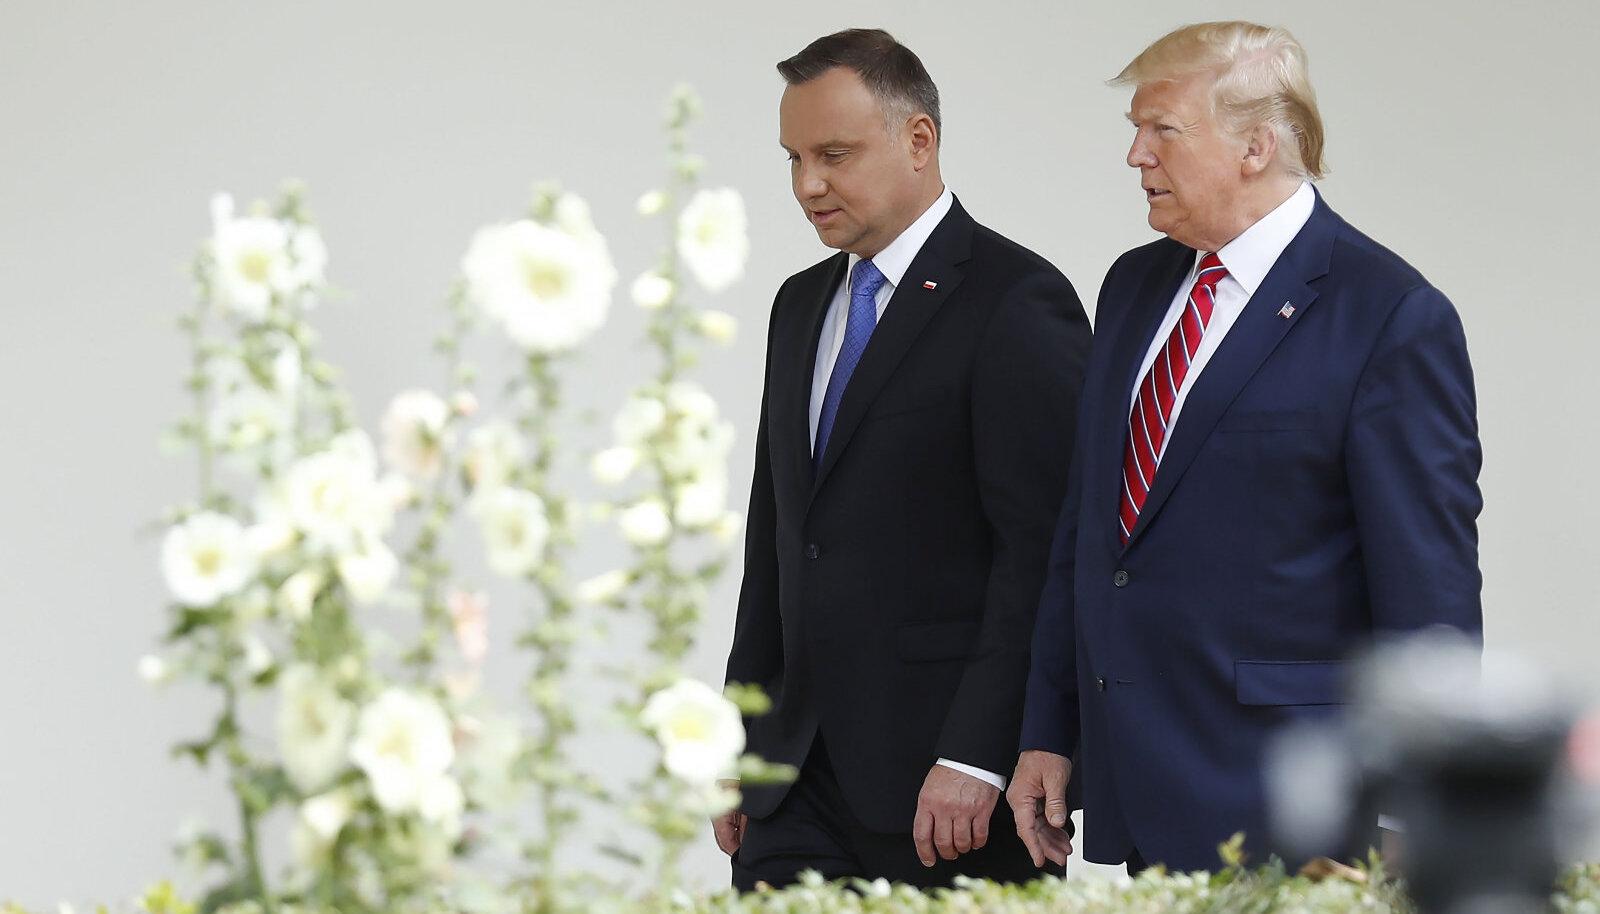 Andrzej Duda ja Donald Trump mullu Valges Majas